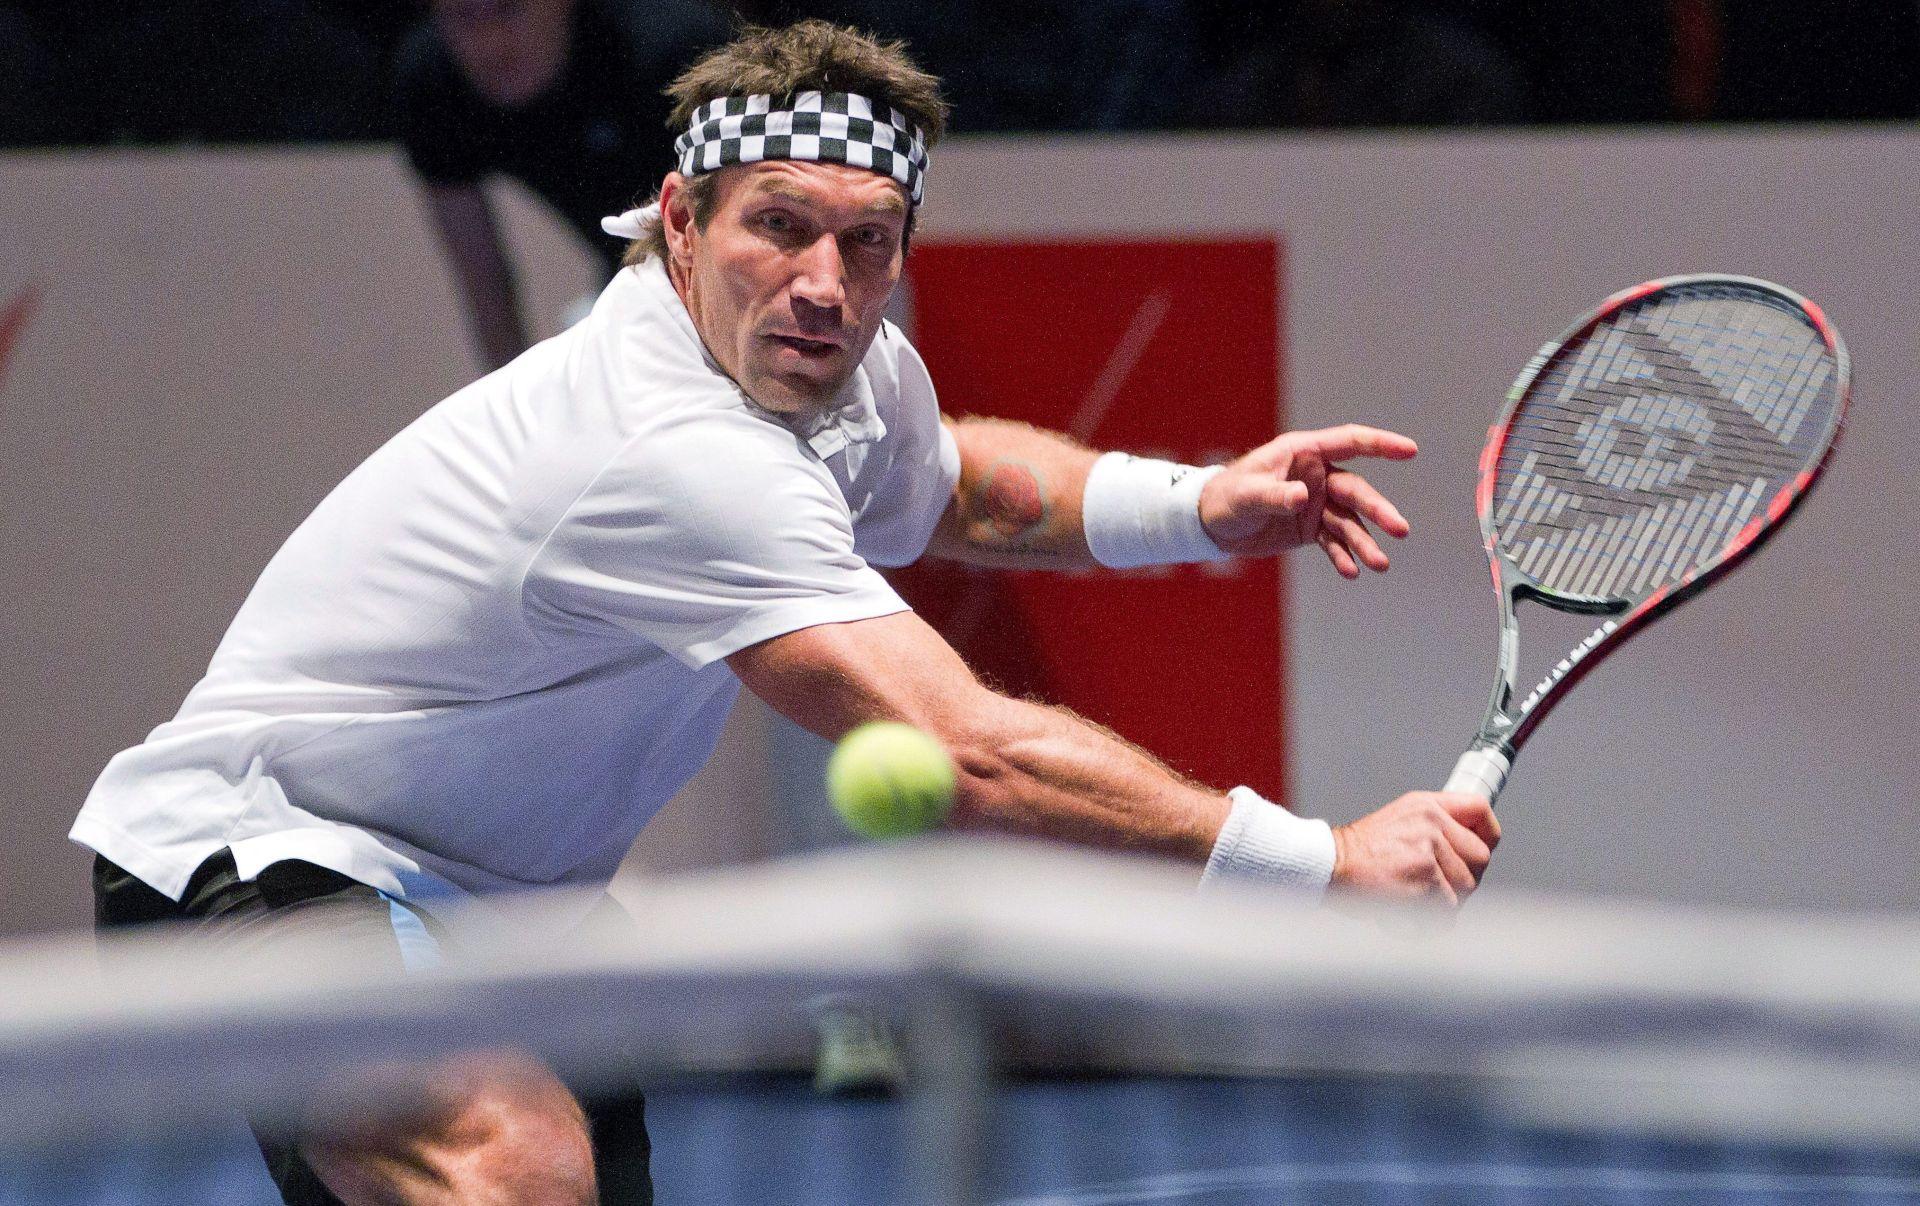 Wimbledon na jedan dan seli u Umag